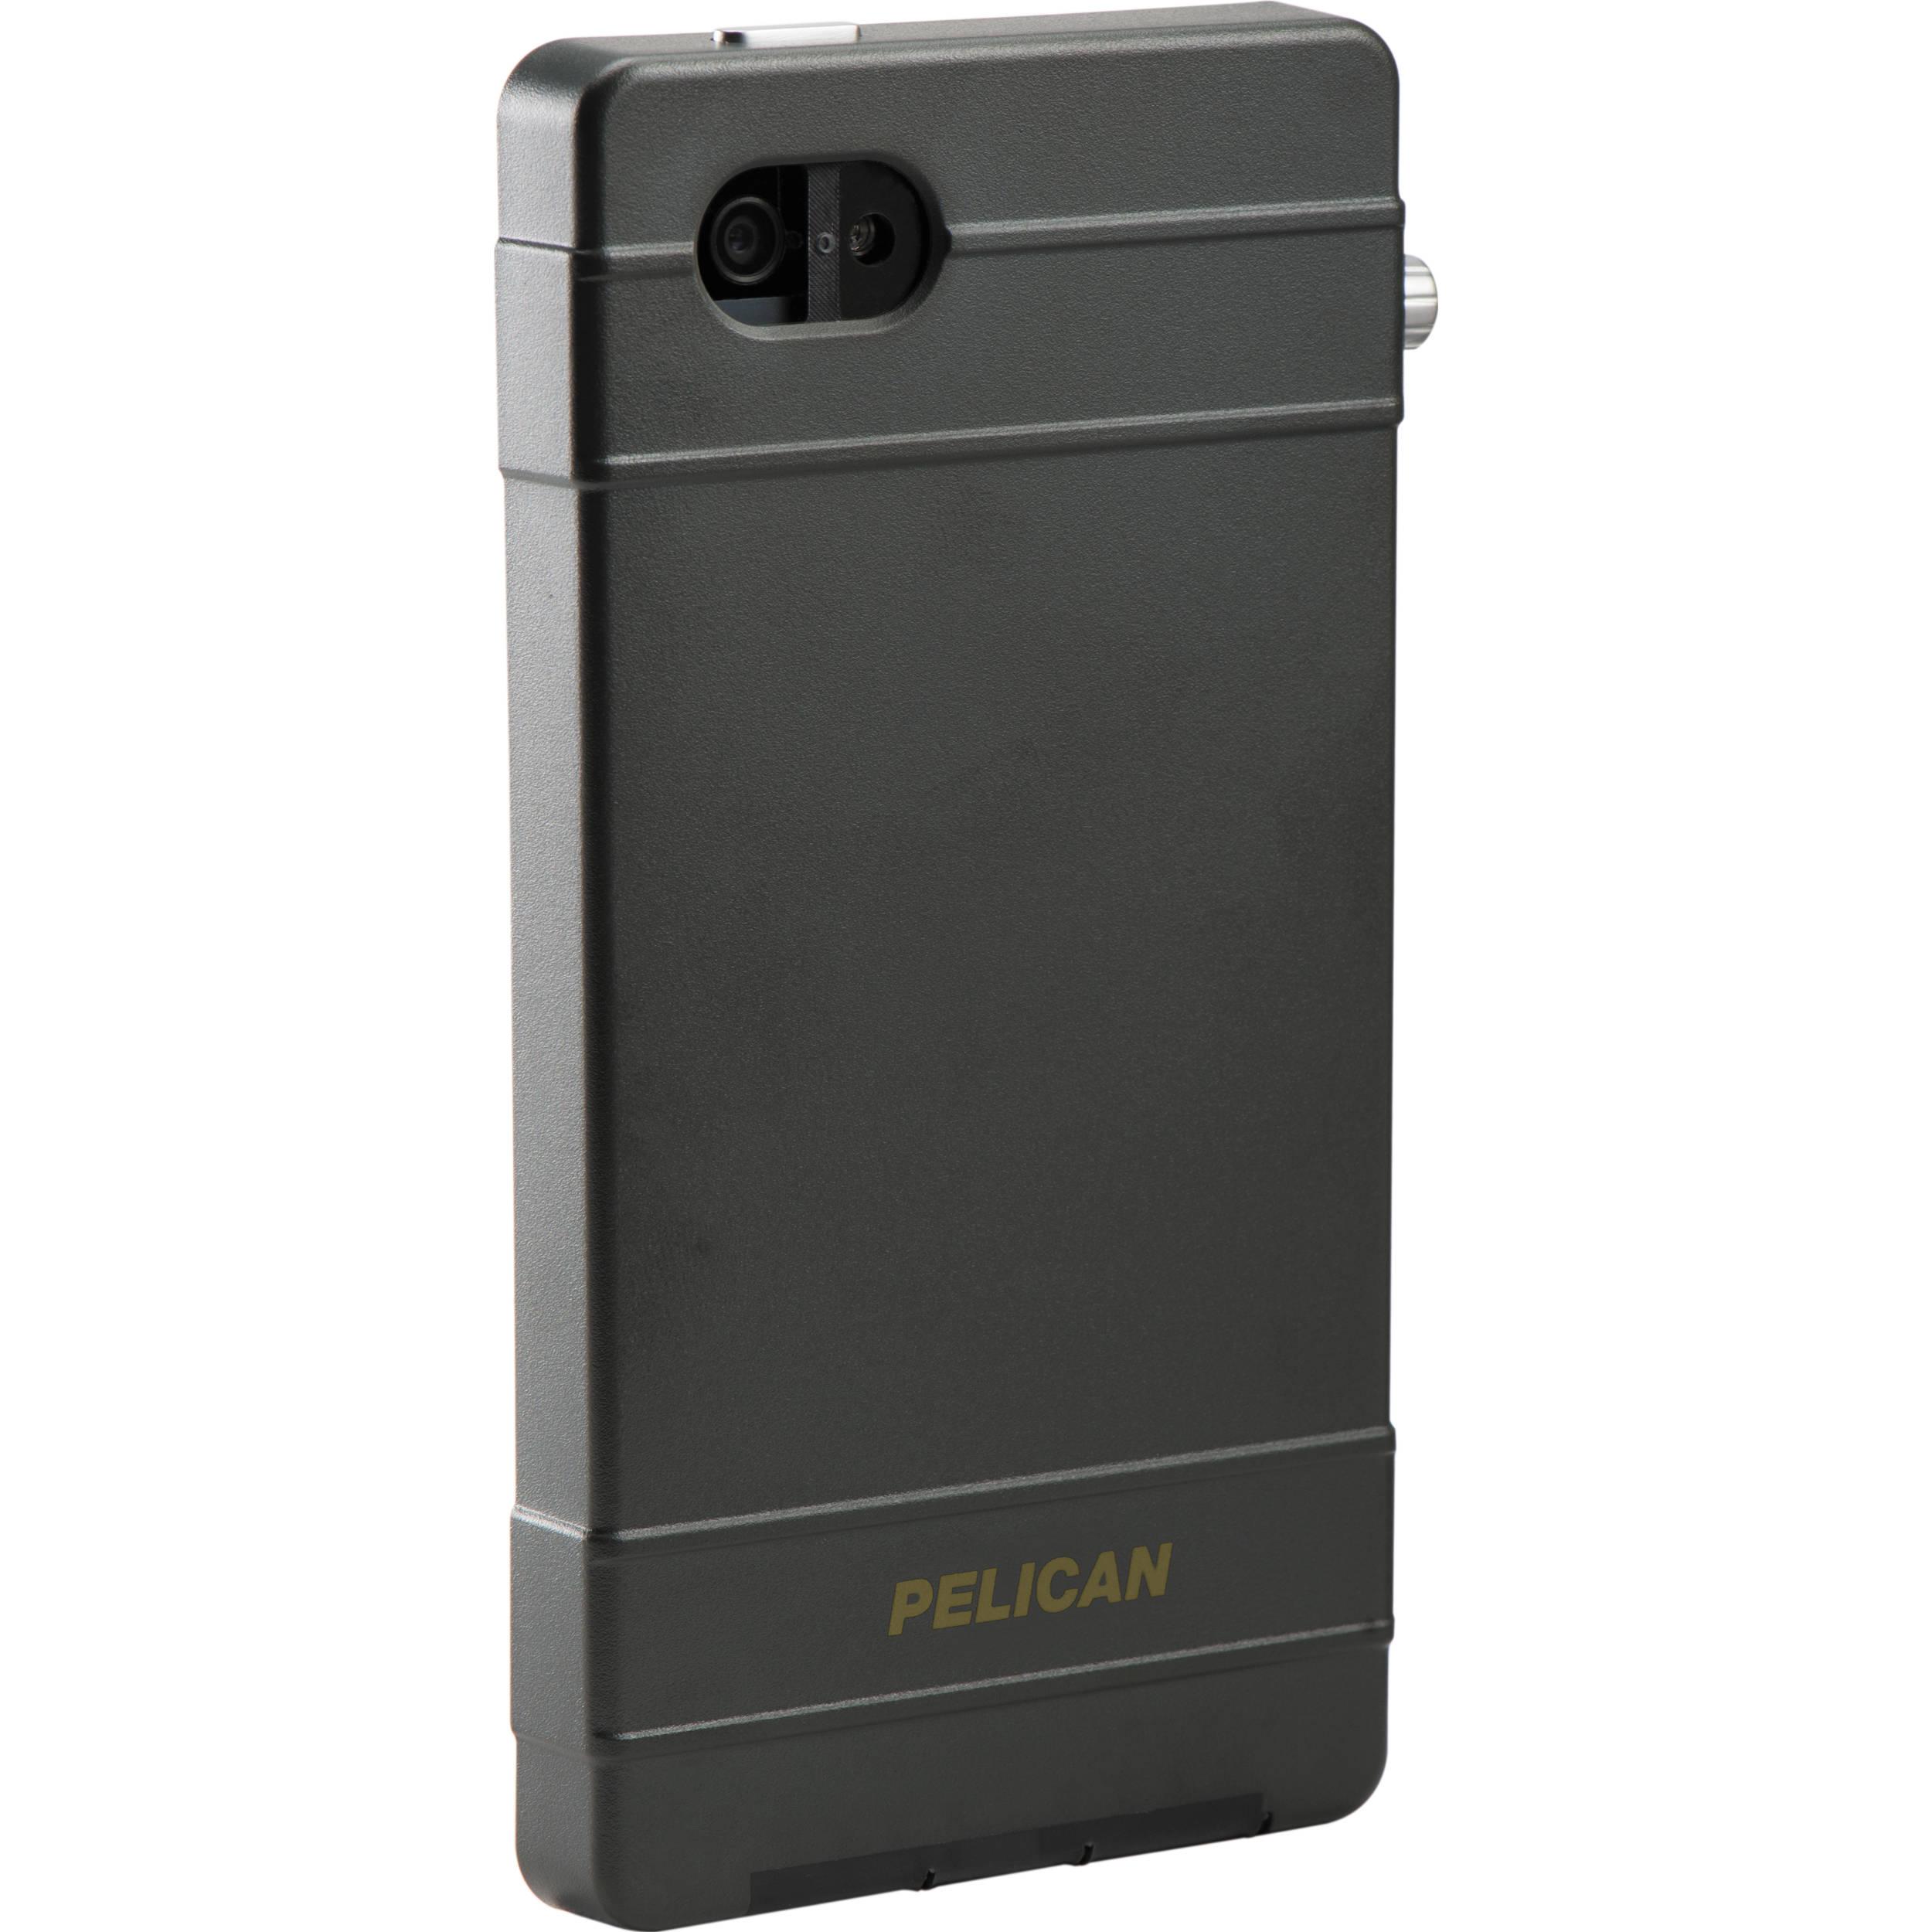 huge discount 9e8e1 9854e Pelican ProGear Vault Series Case for iPhone 5 (Green / Black)